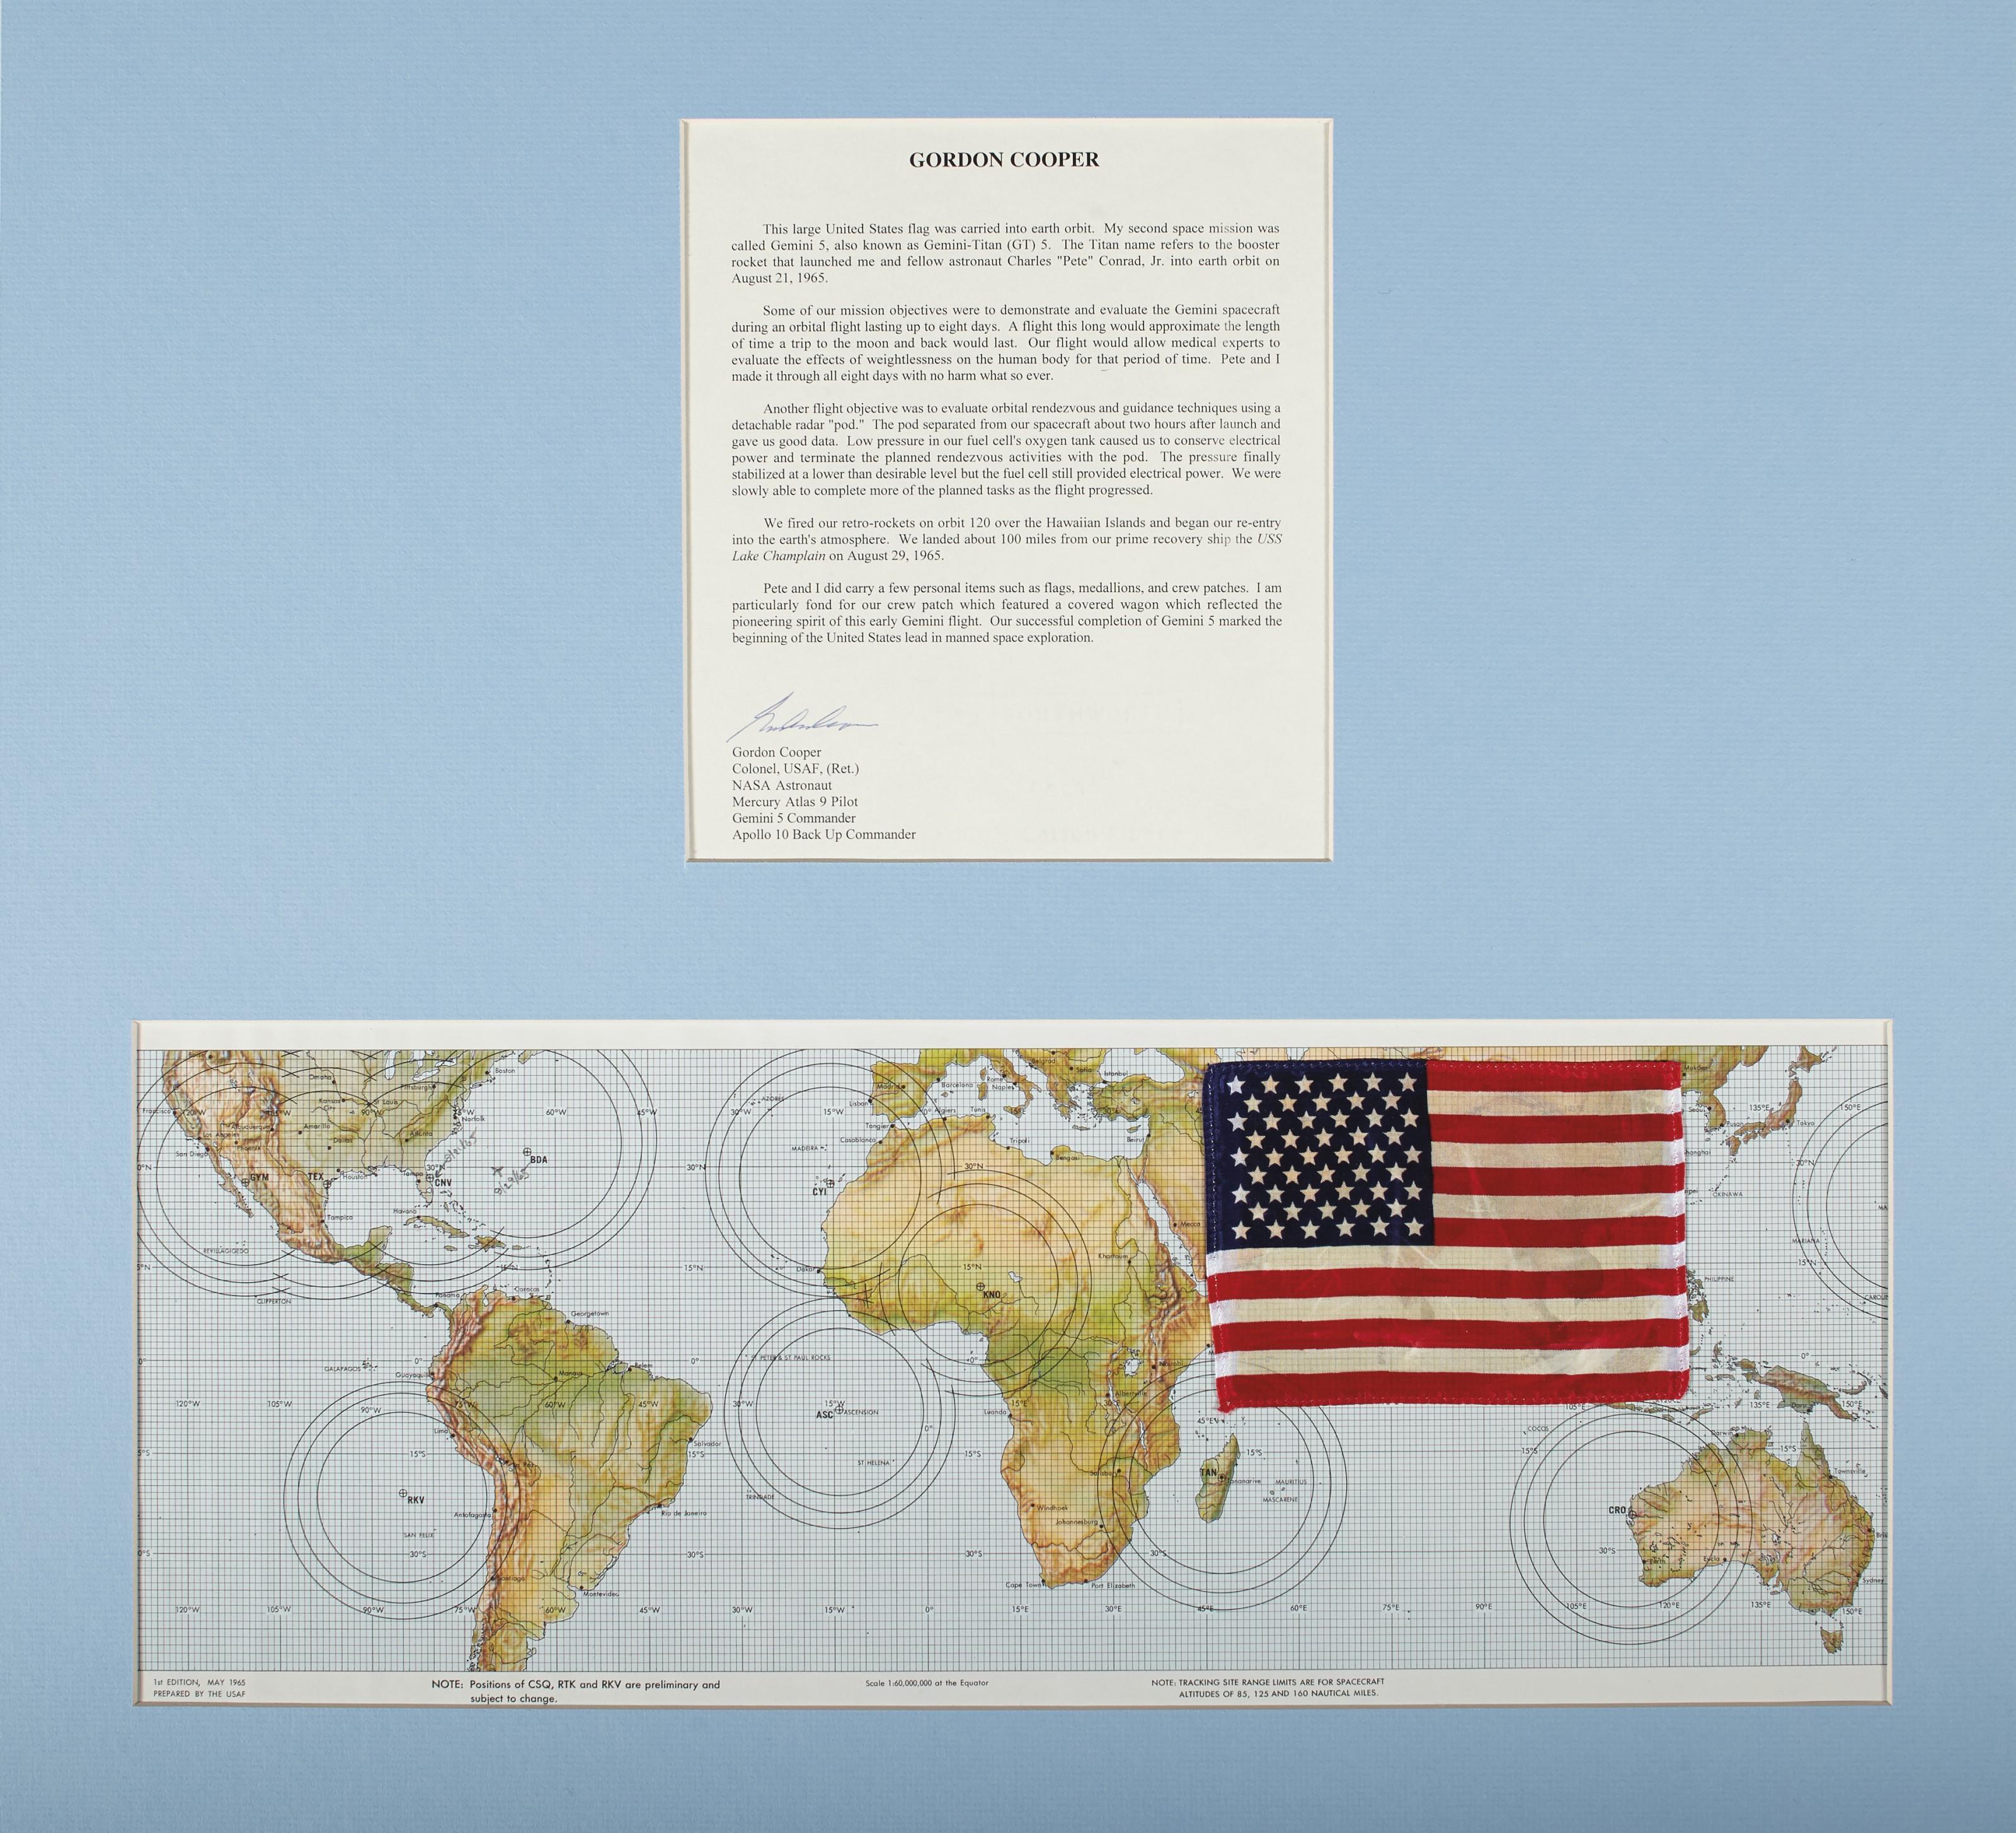 FLOWN ON GEMINI 5 – United States flag, 1965.